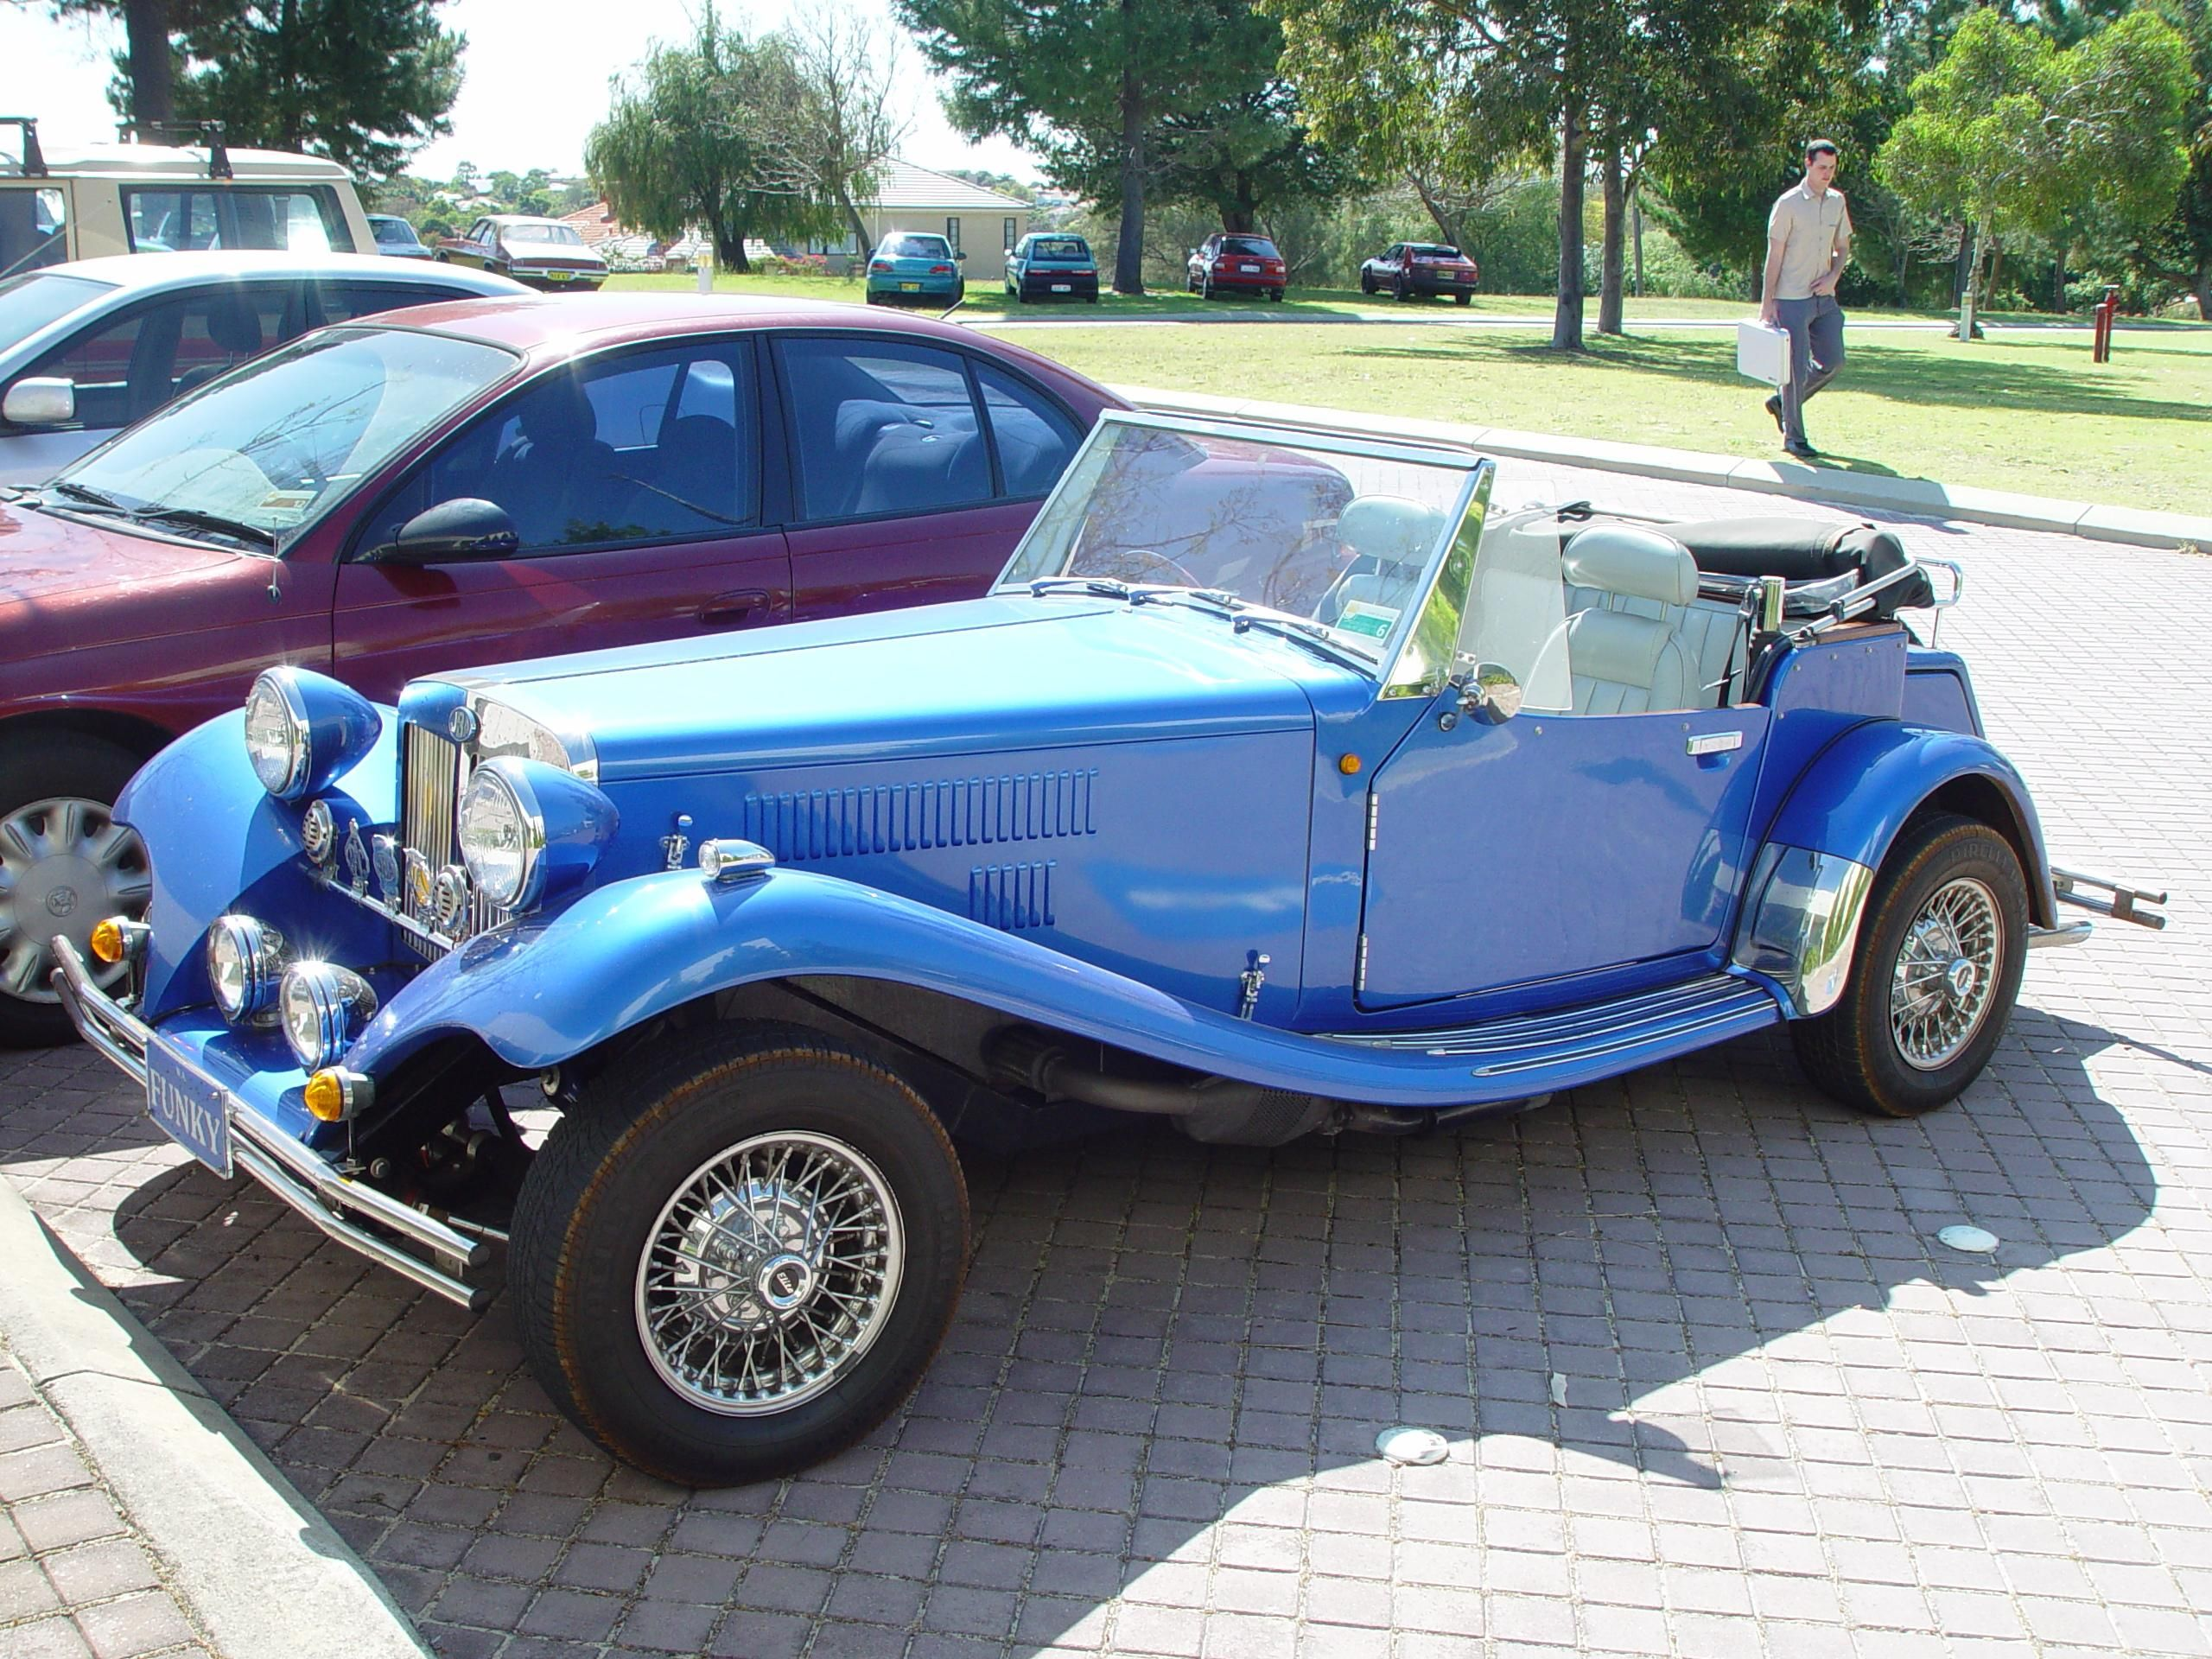 Blue Car In Lumber Tycoon